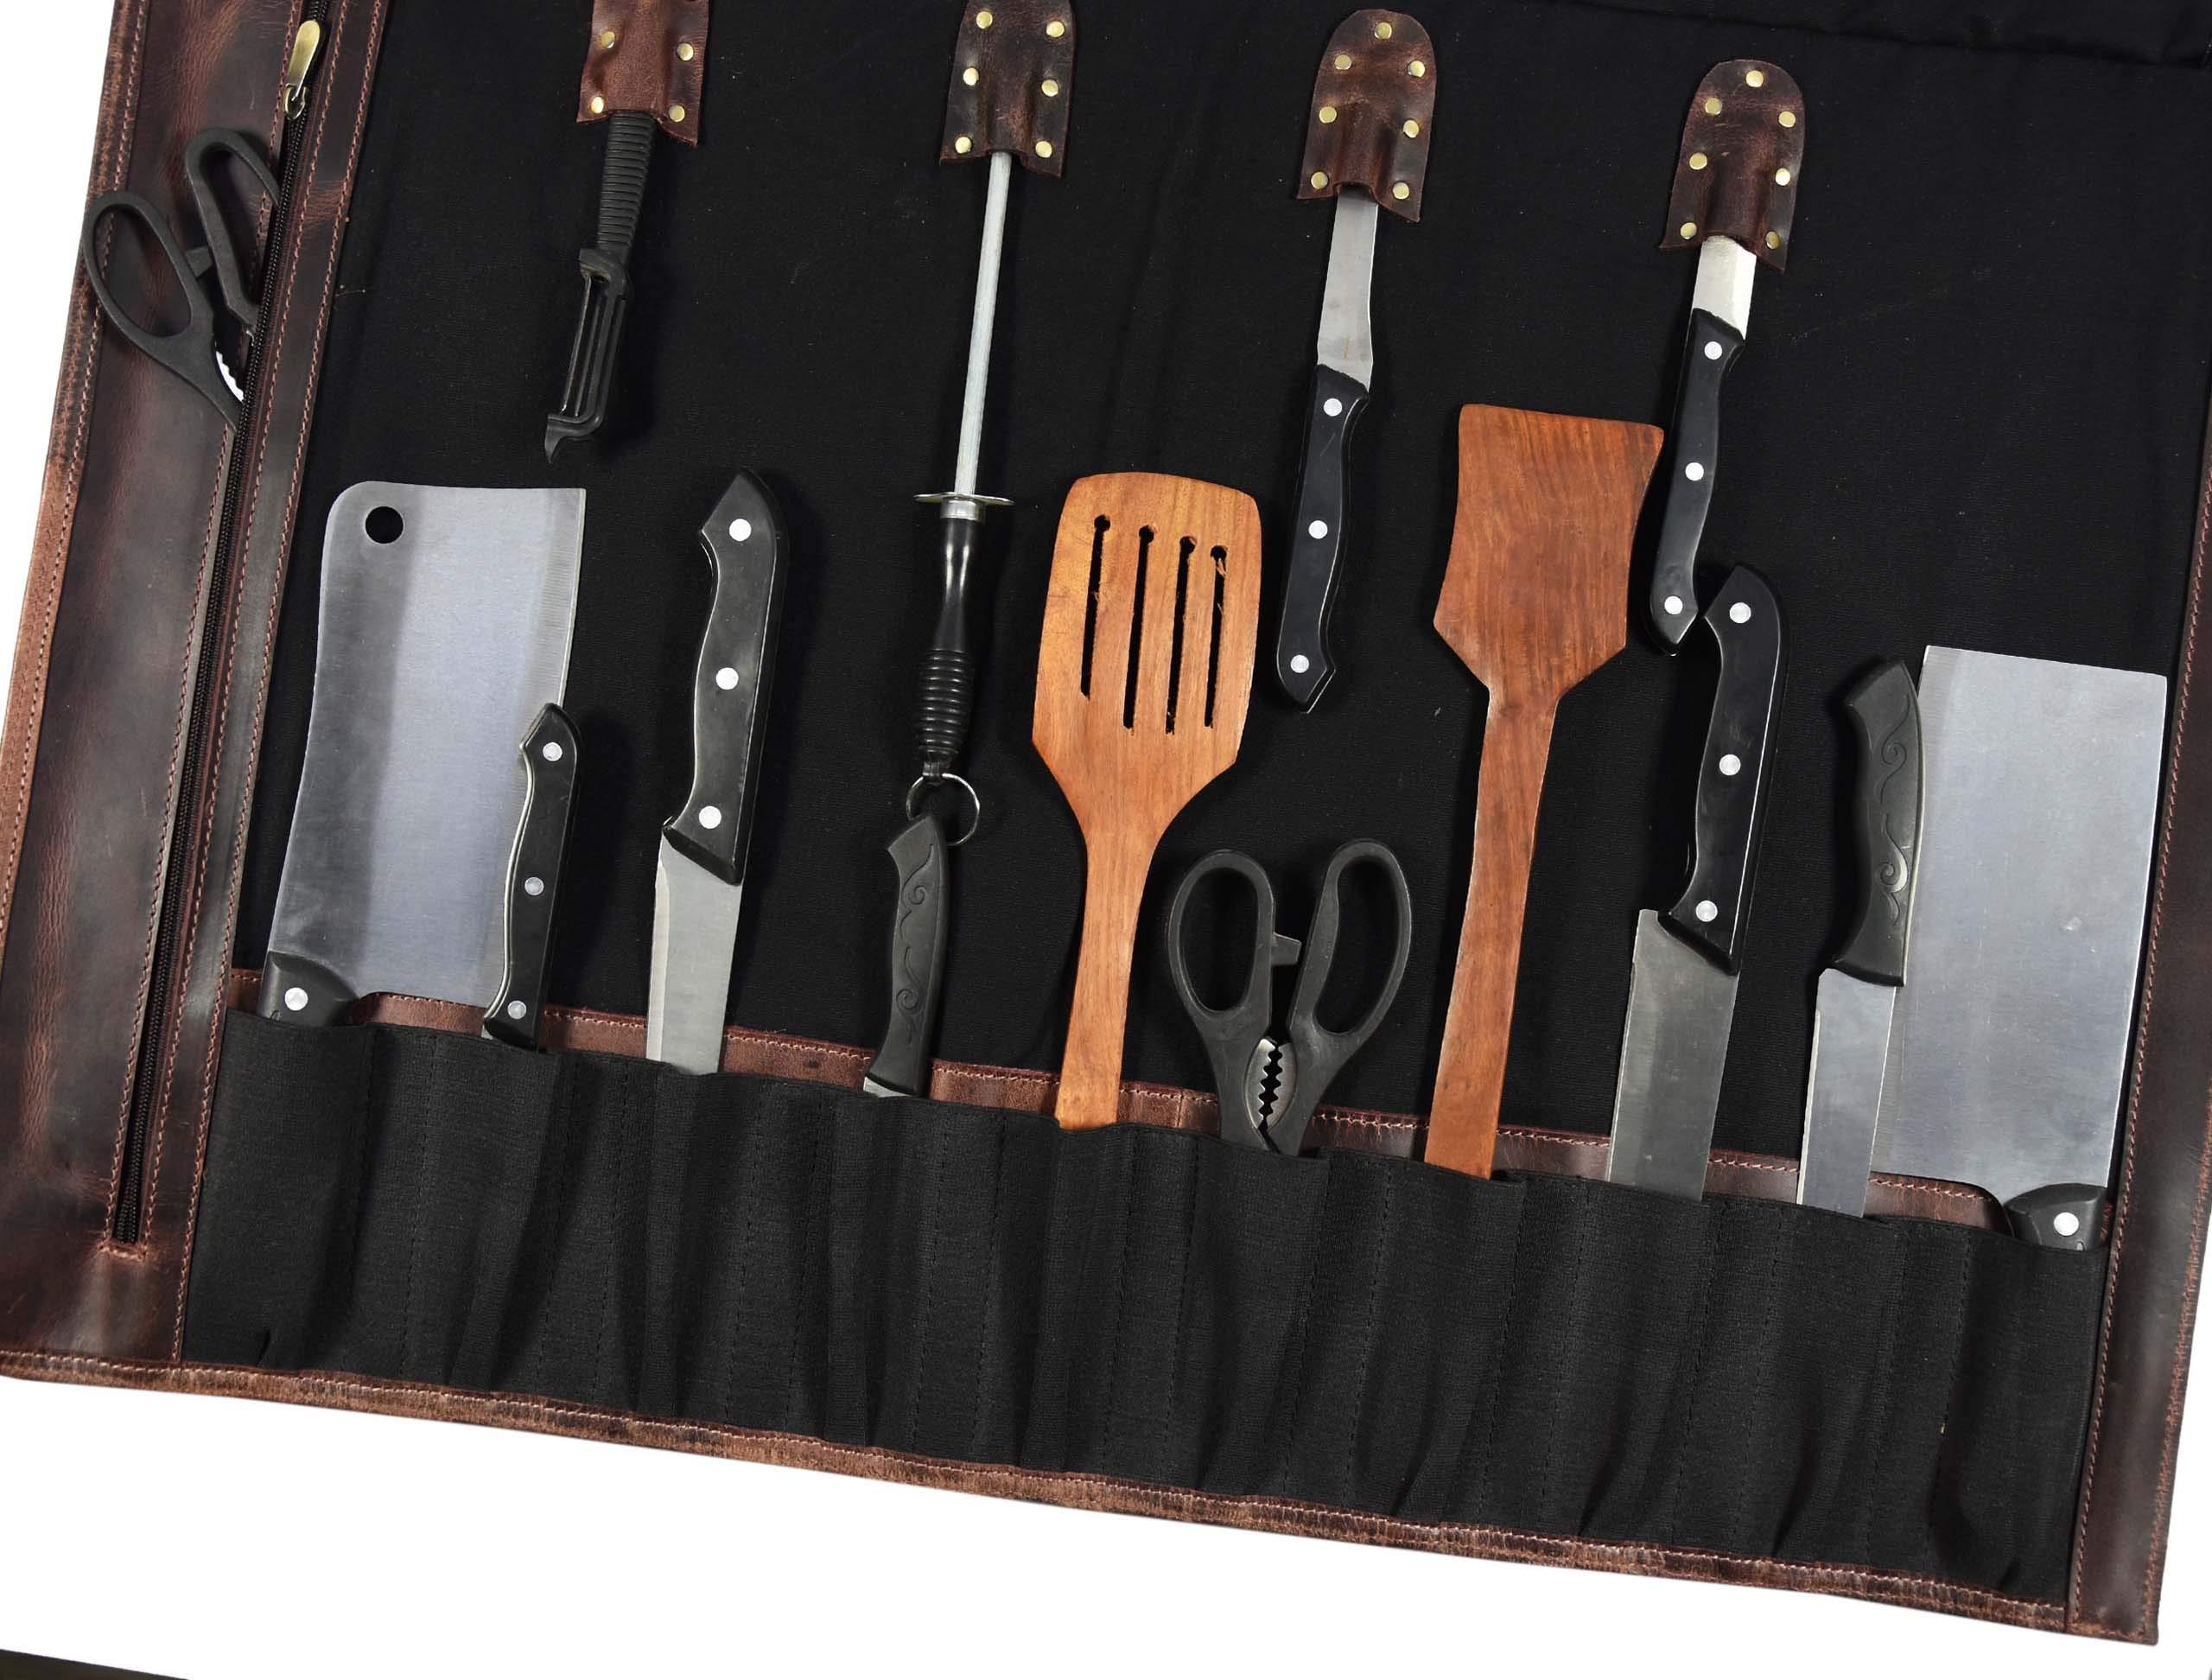 Leather Knife Roll Storage Bag   Elastic and Expandable 10 Pockets   Adjustable/Detachable Shoulder Strap   Travel-Friendly Chef Knife Case Roll By Aaron Leather (Raven, Canvas) by AARON LEATHER GOODS VENDIMIA ESTILO (Image #5)